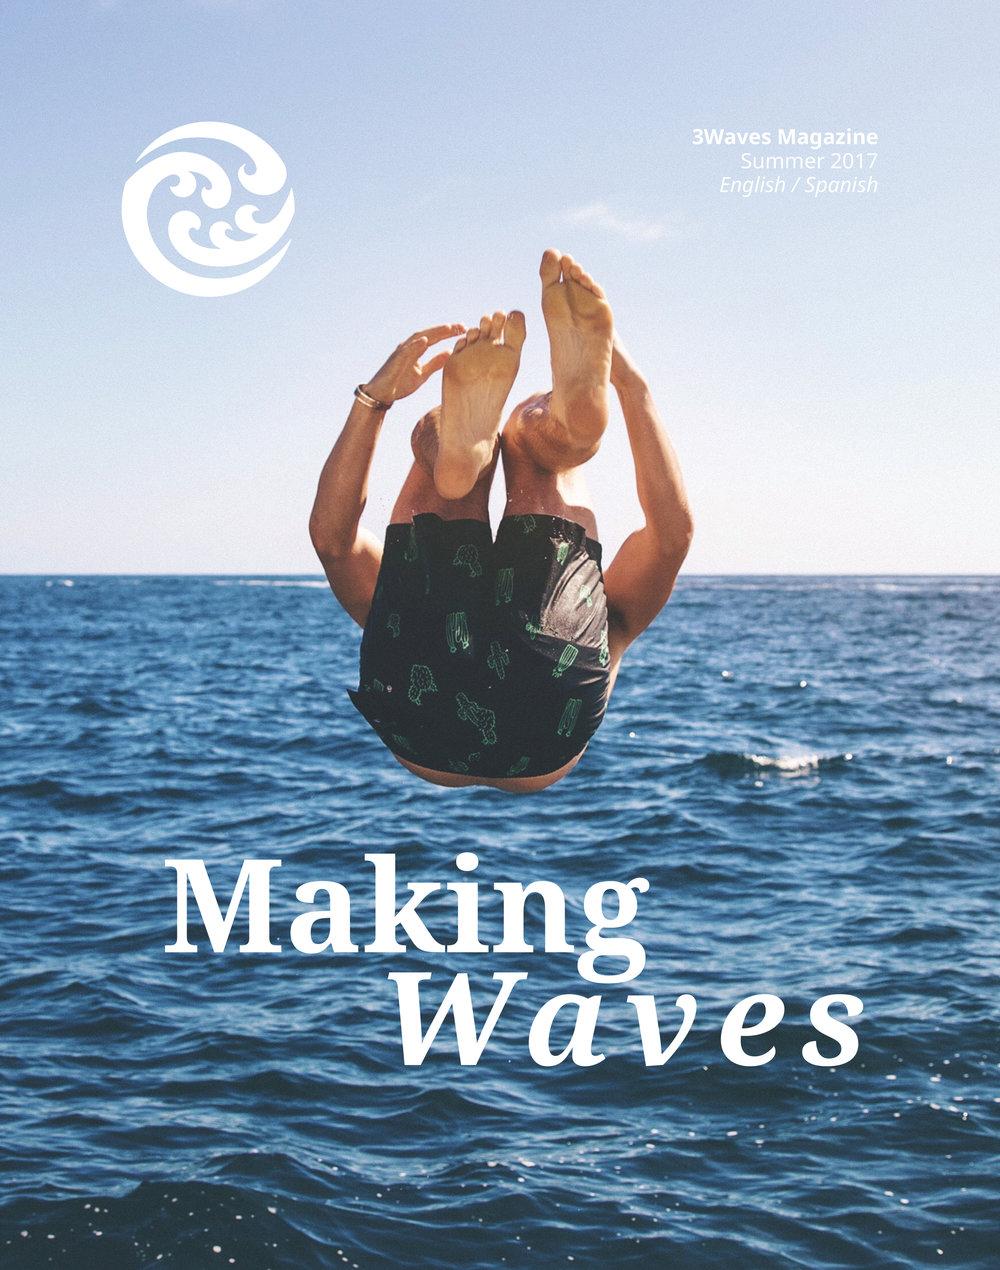 Issue 11 - June 2017: English